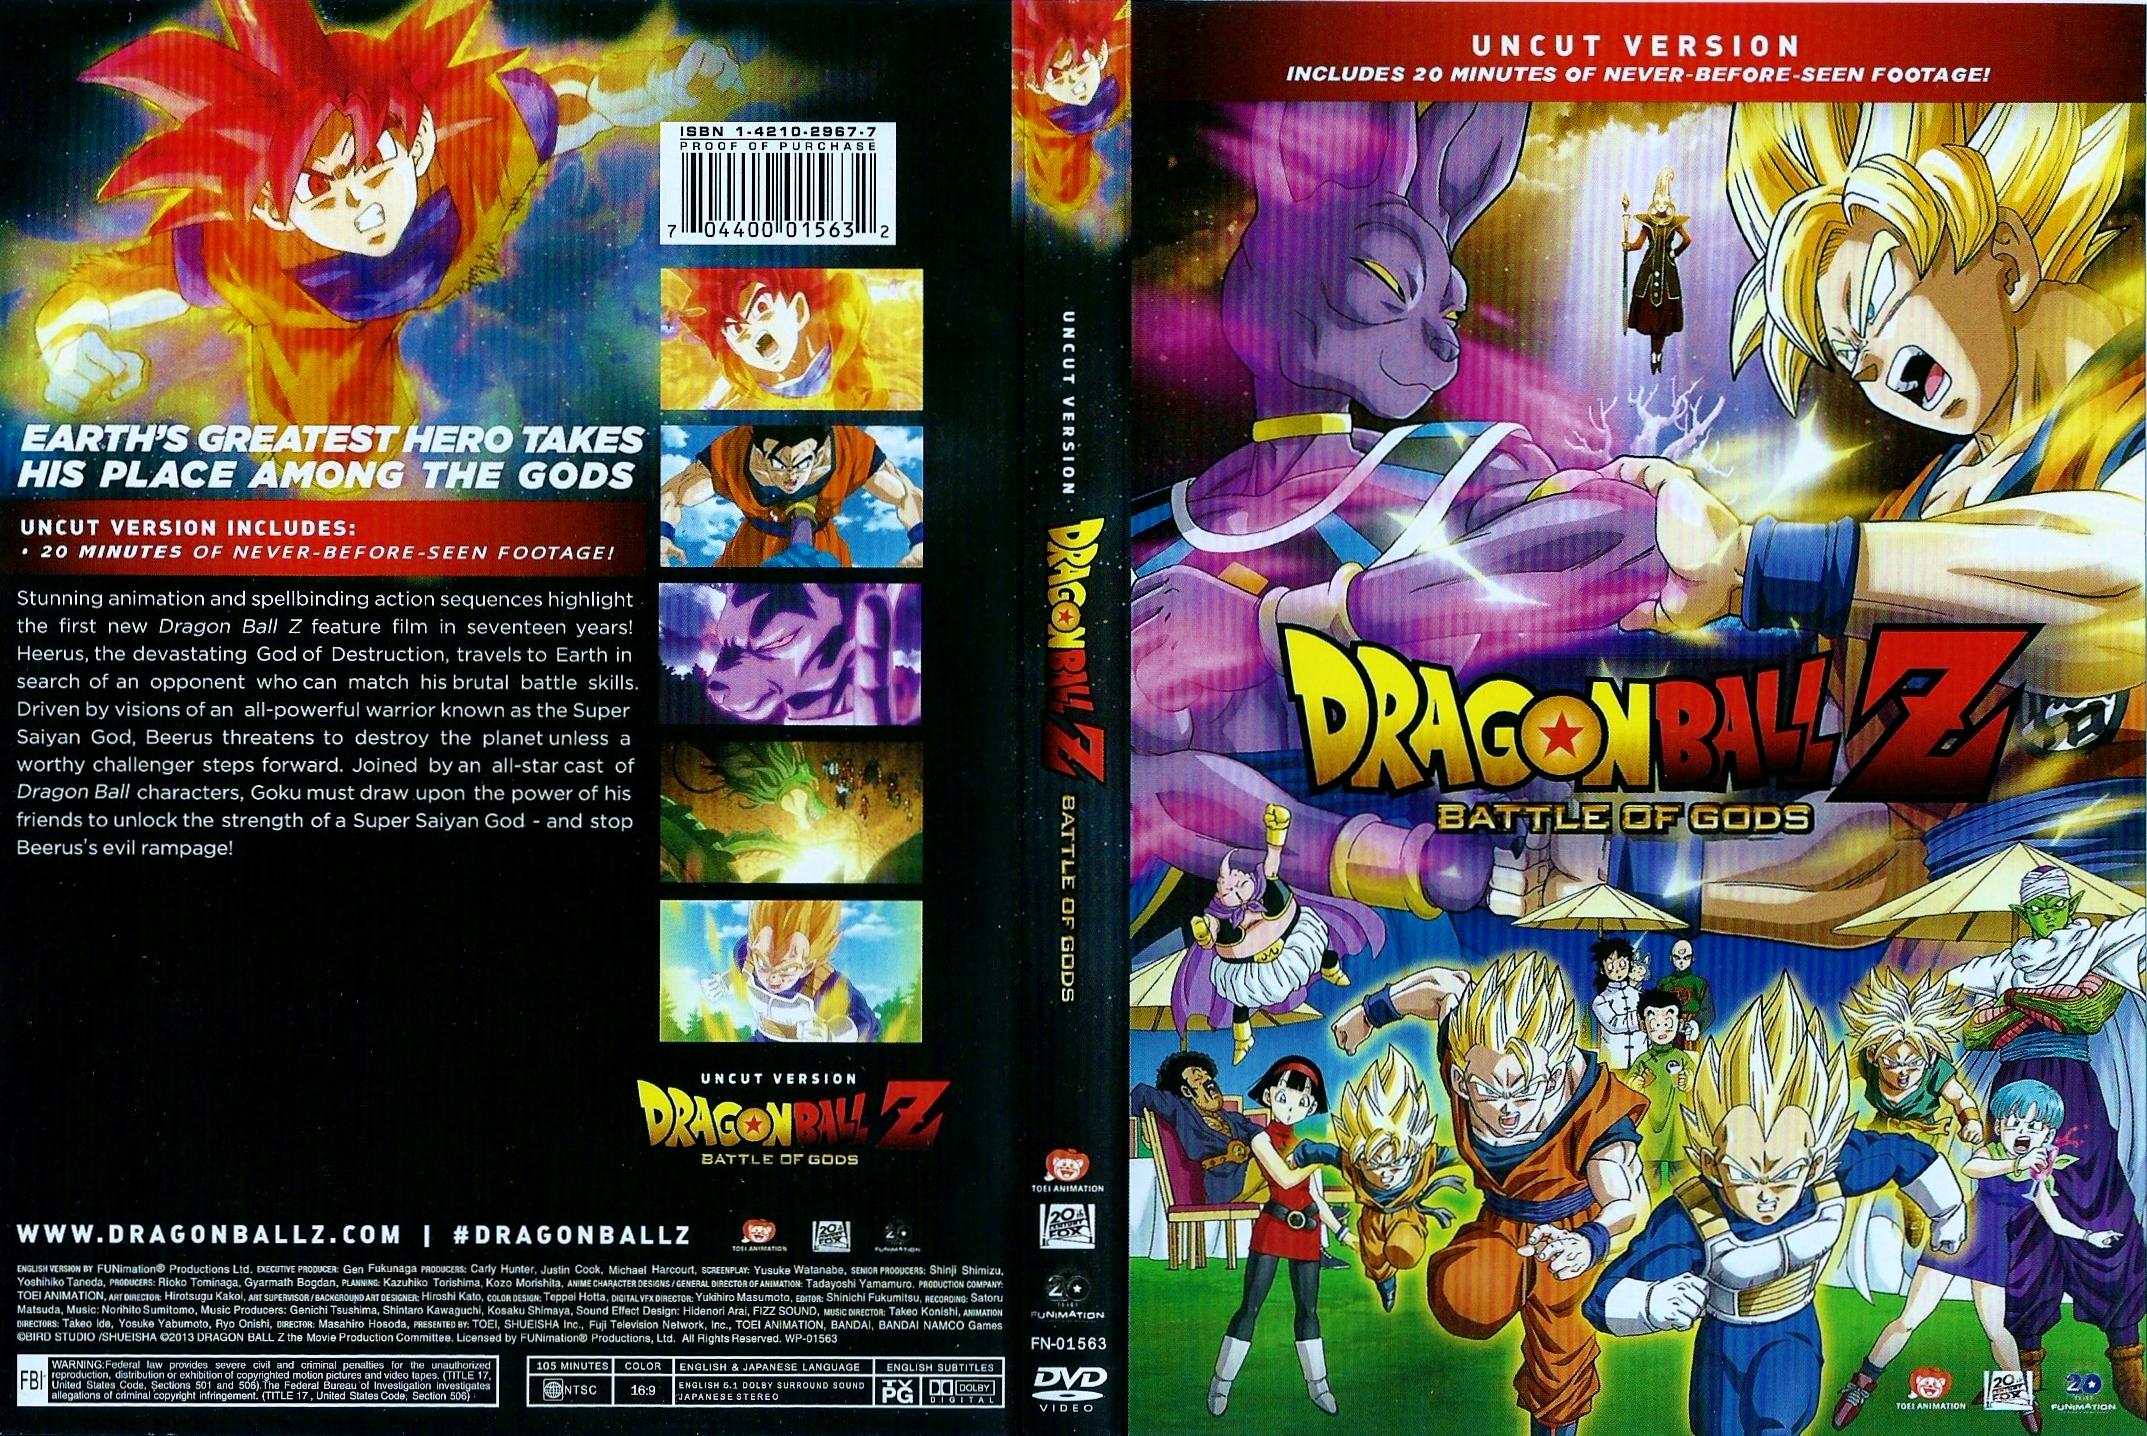 covers box sk dragon ball z battle of gods high quality dvd